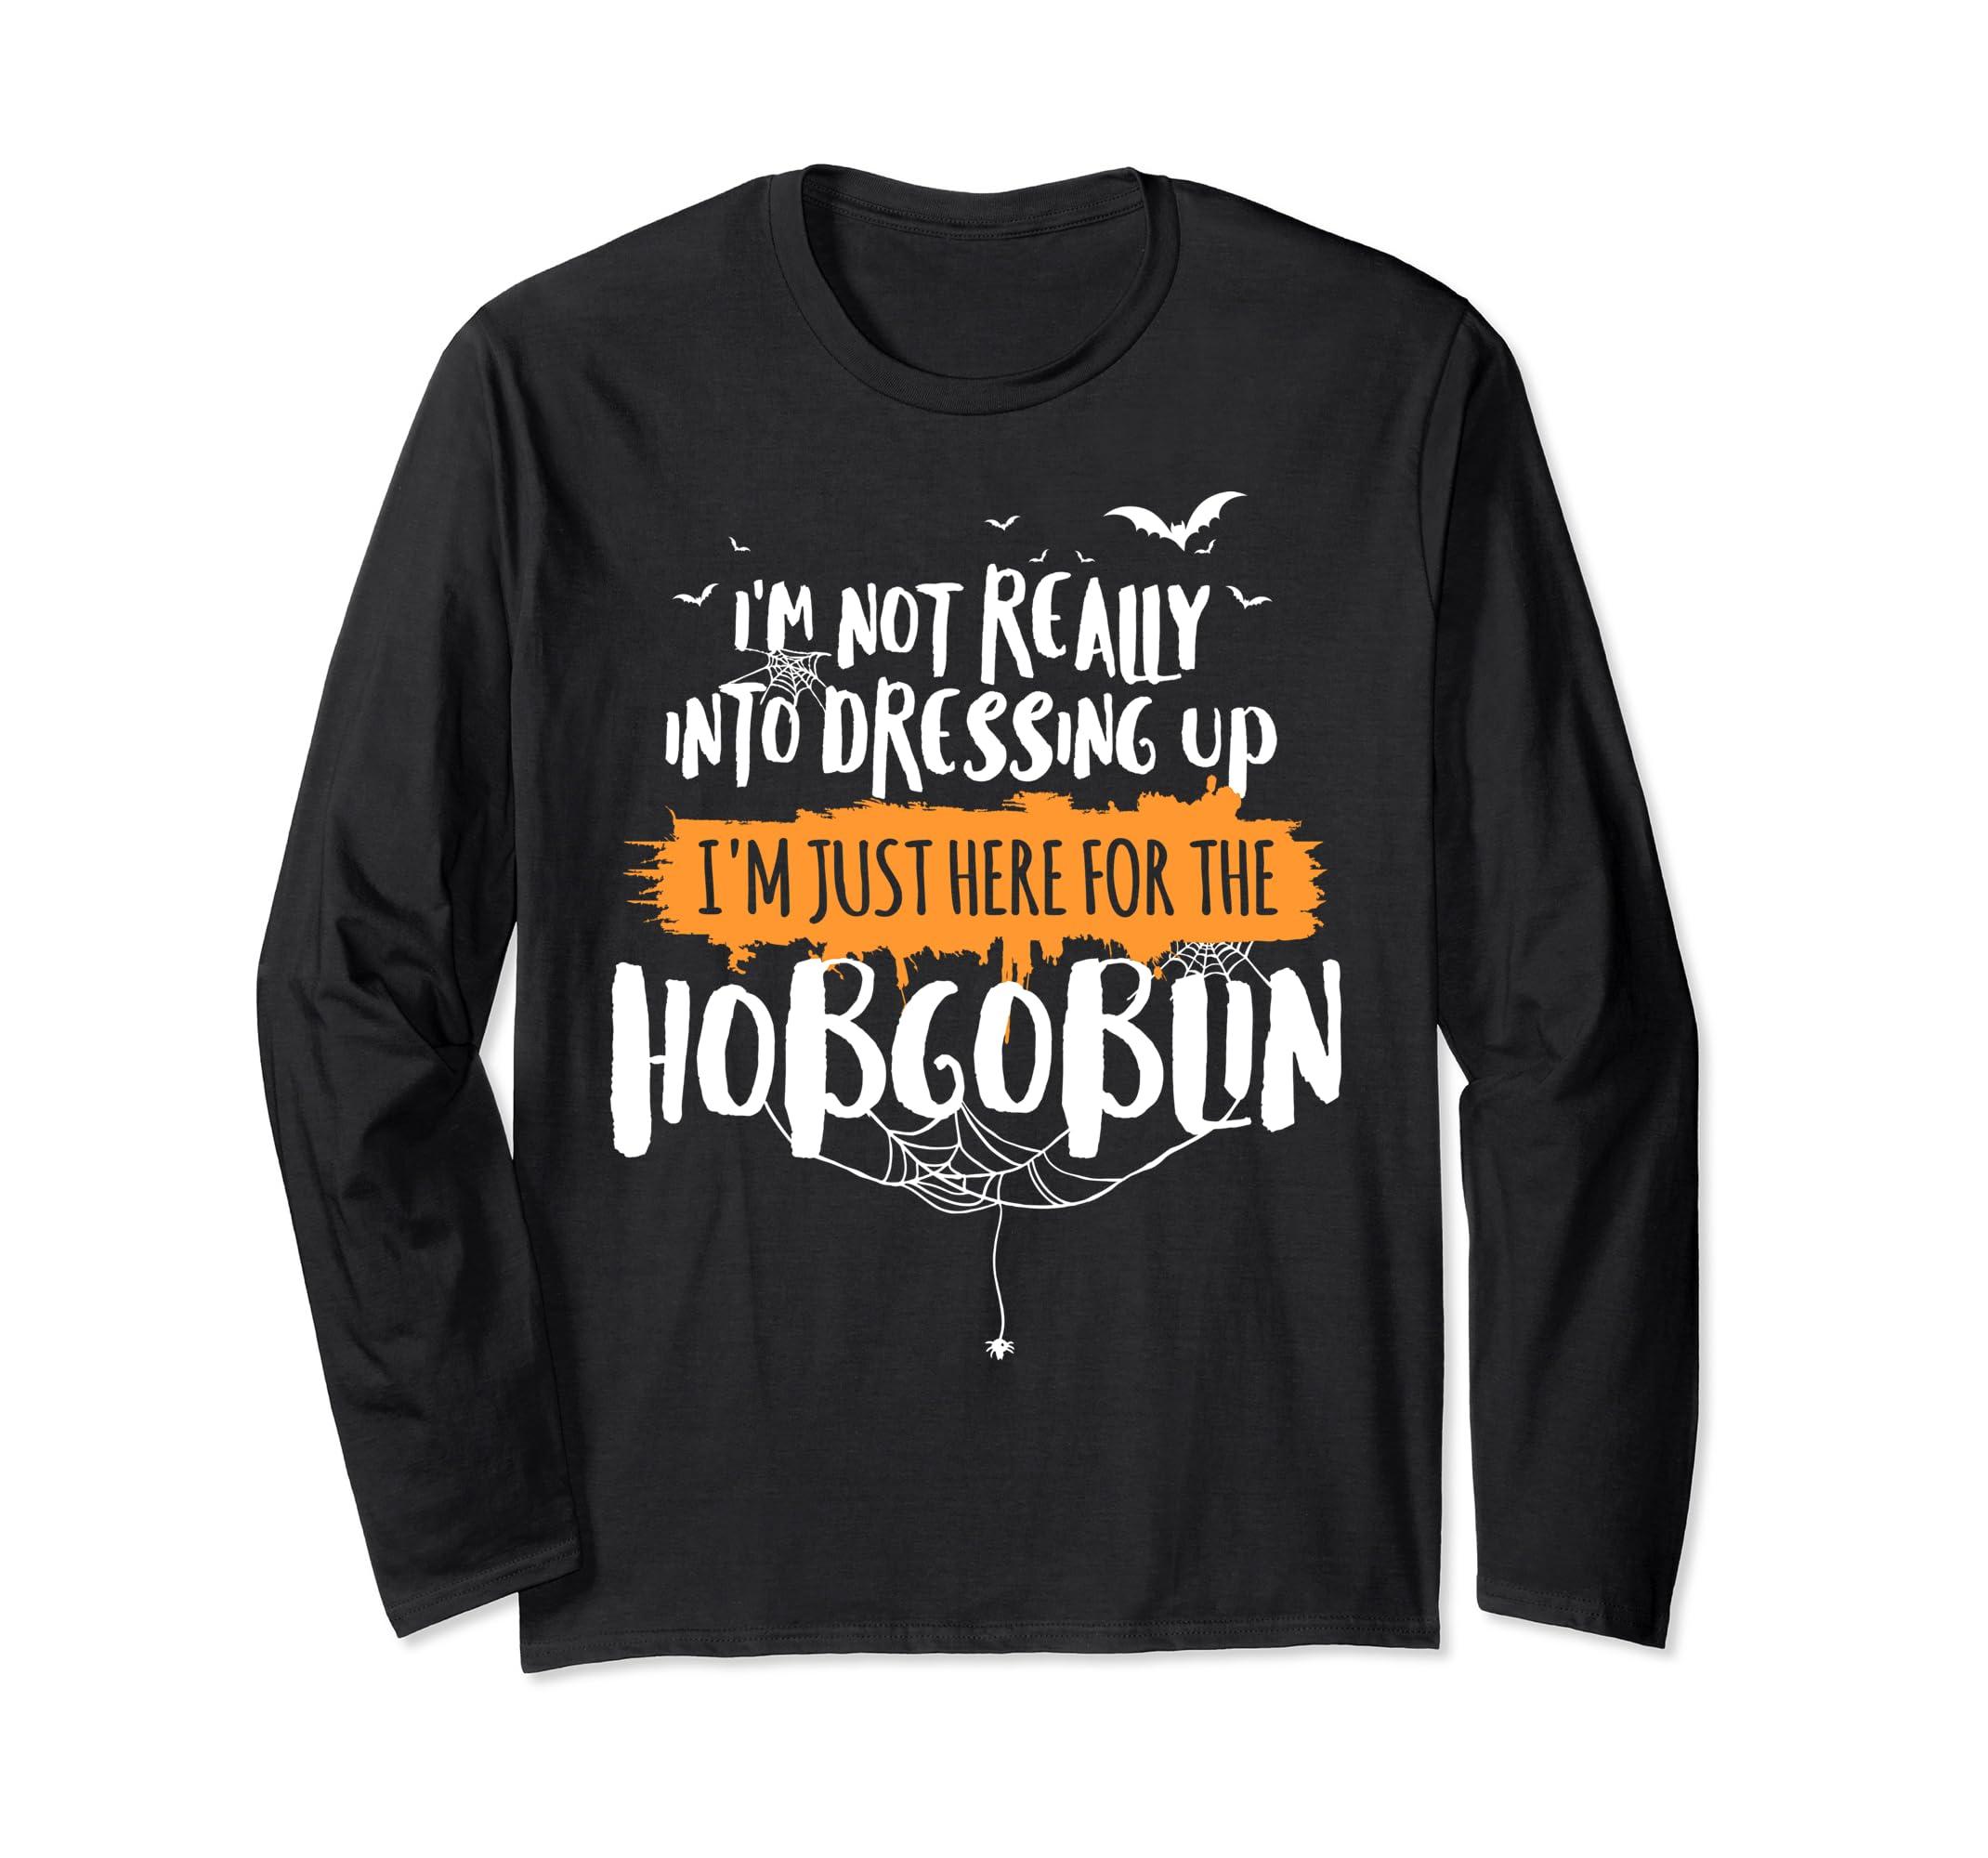 Funny Halloween Long Sleeve   Here for the Hobgoblin-Bawle